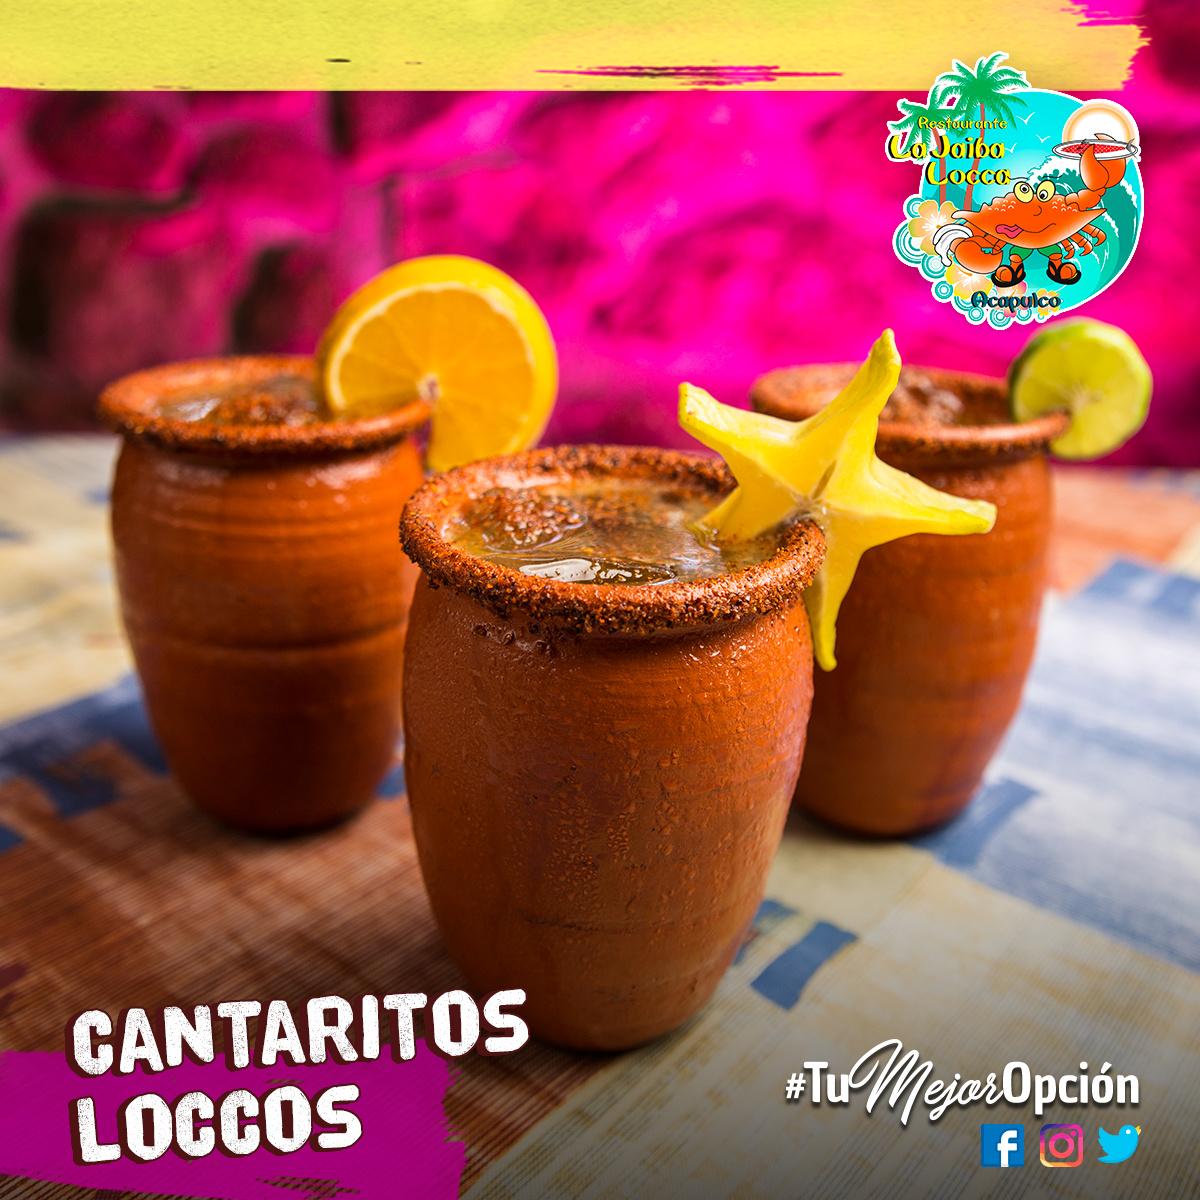 https://0201.nccdn.net/1_2/000/000/124/c67/Cantaritos-Loccos-1200x1200.jpg